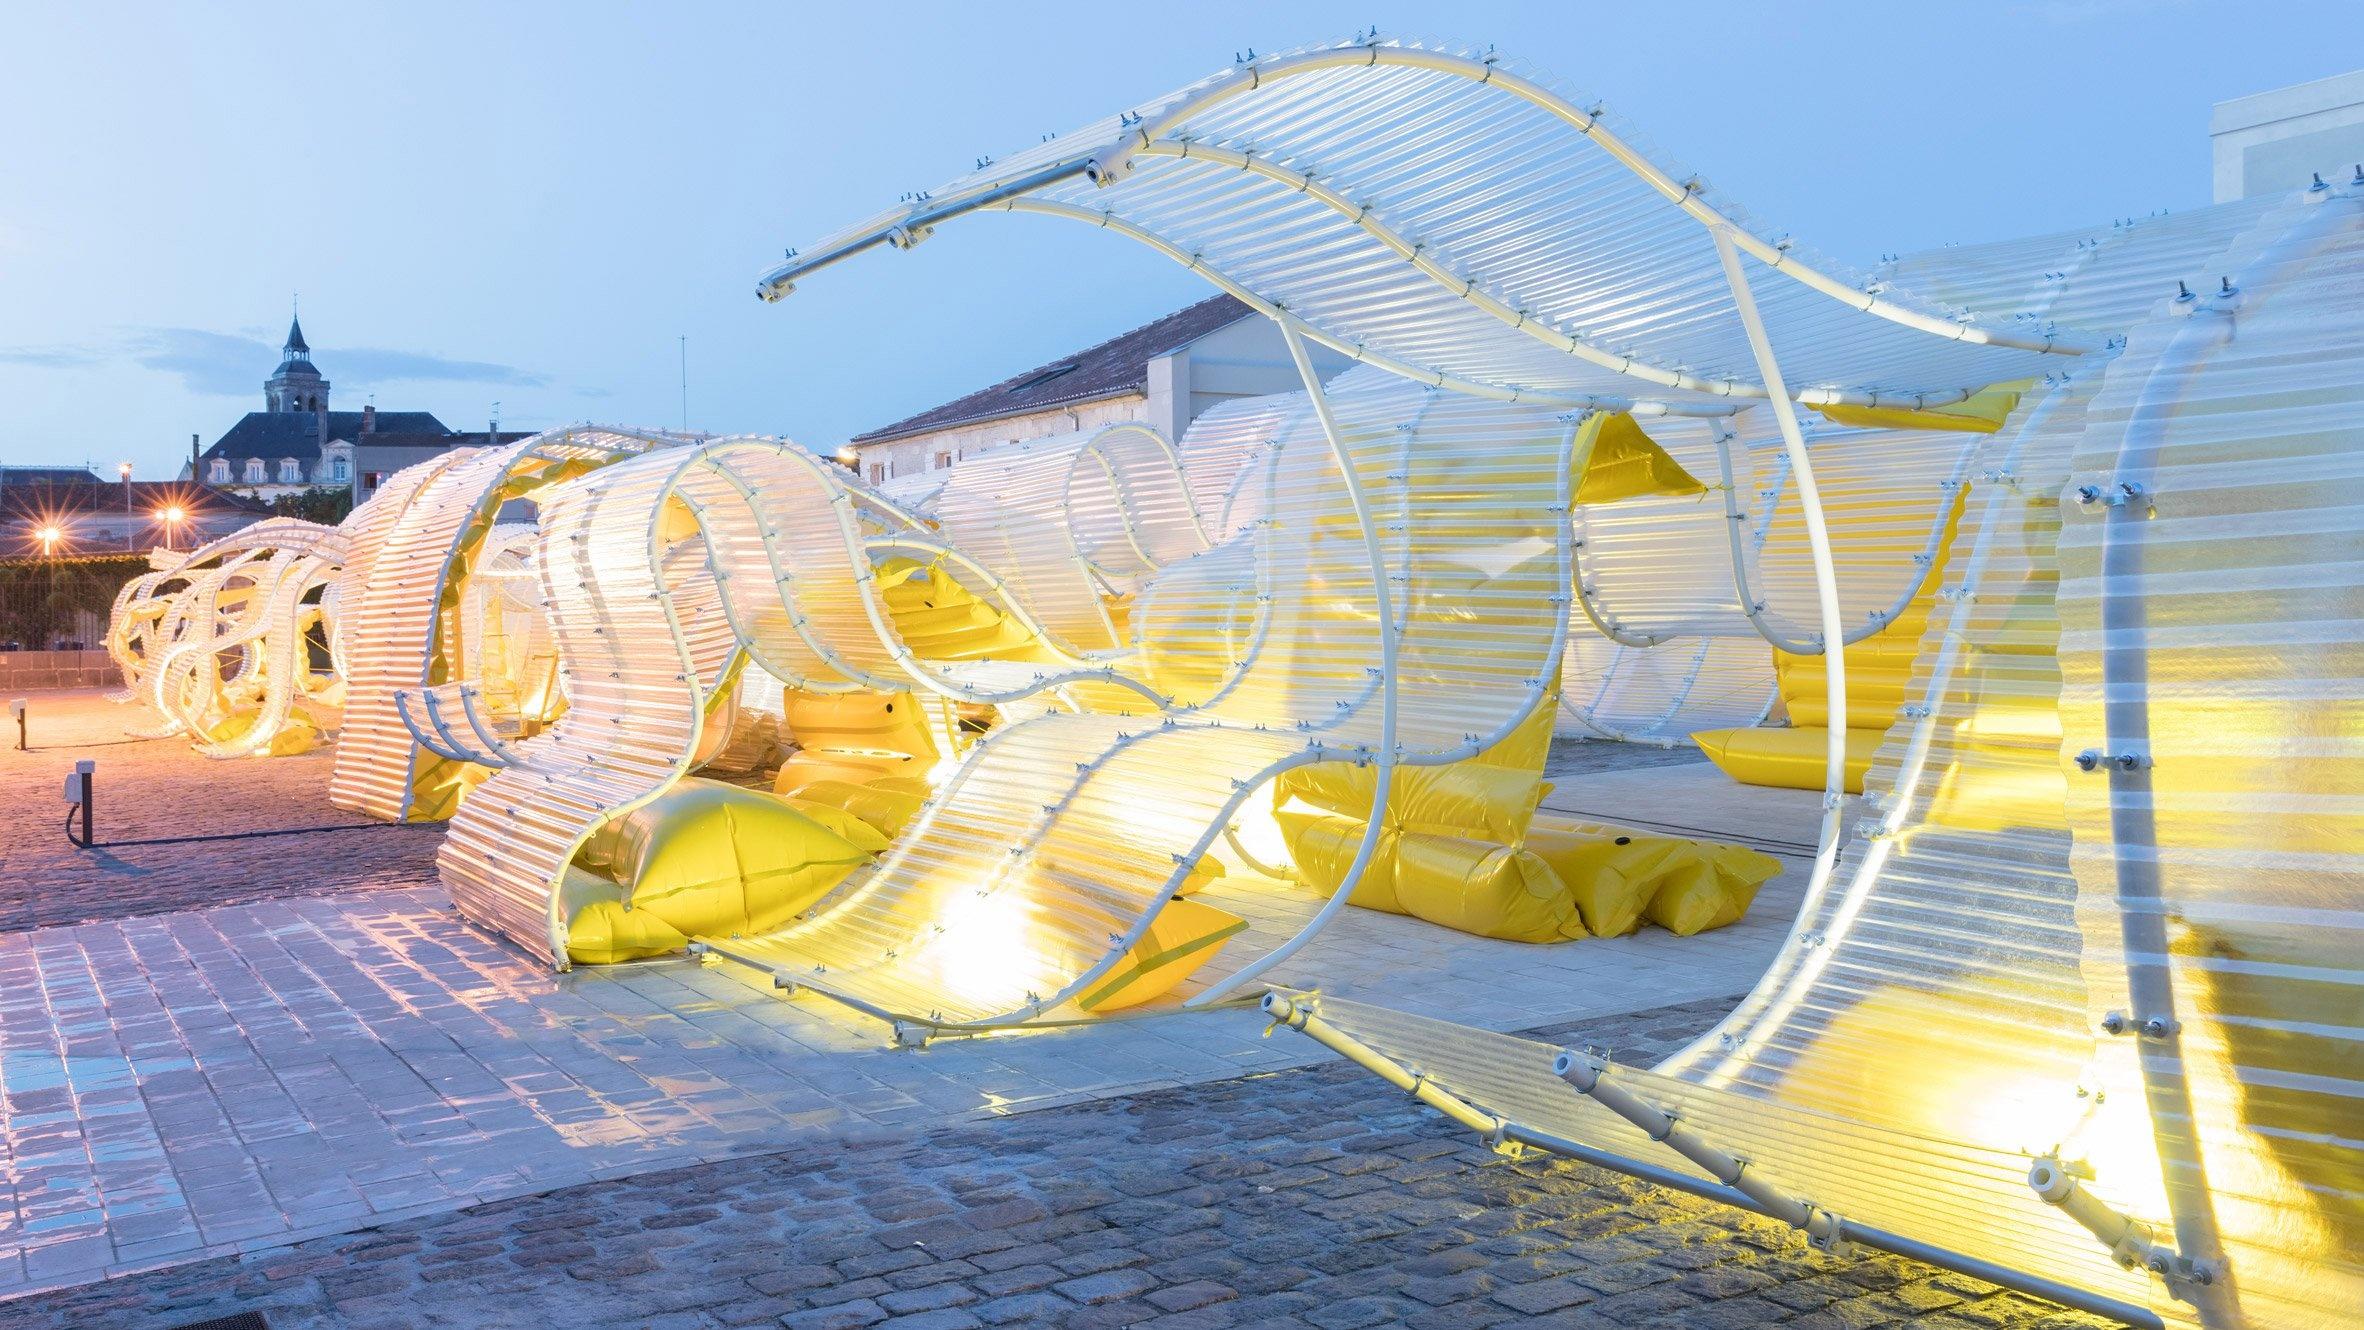 pavilion-selgascano-architecture-france_dezeen_hero-b_03